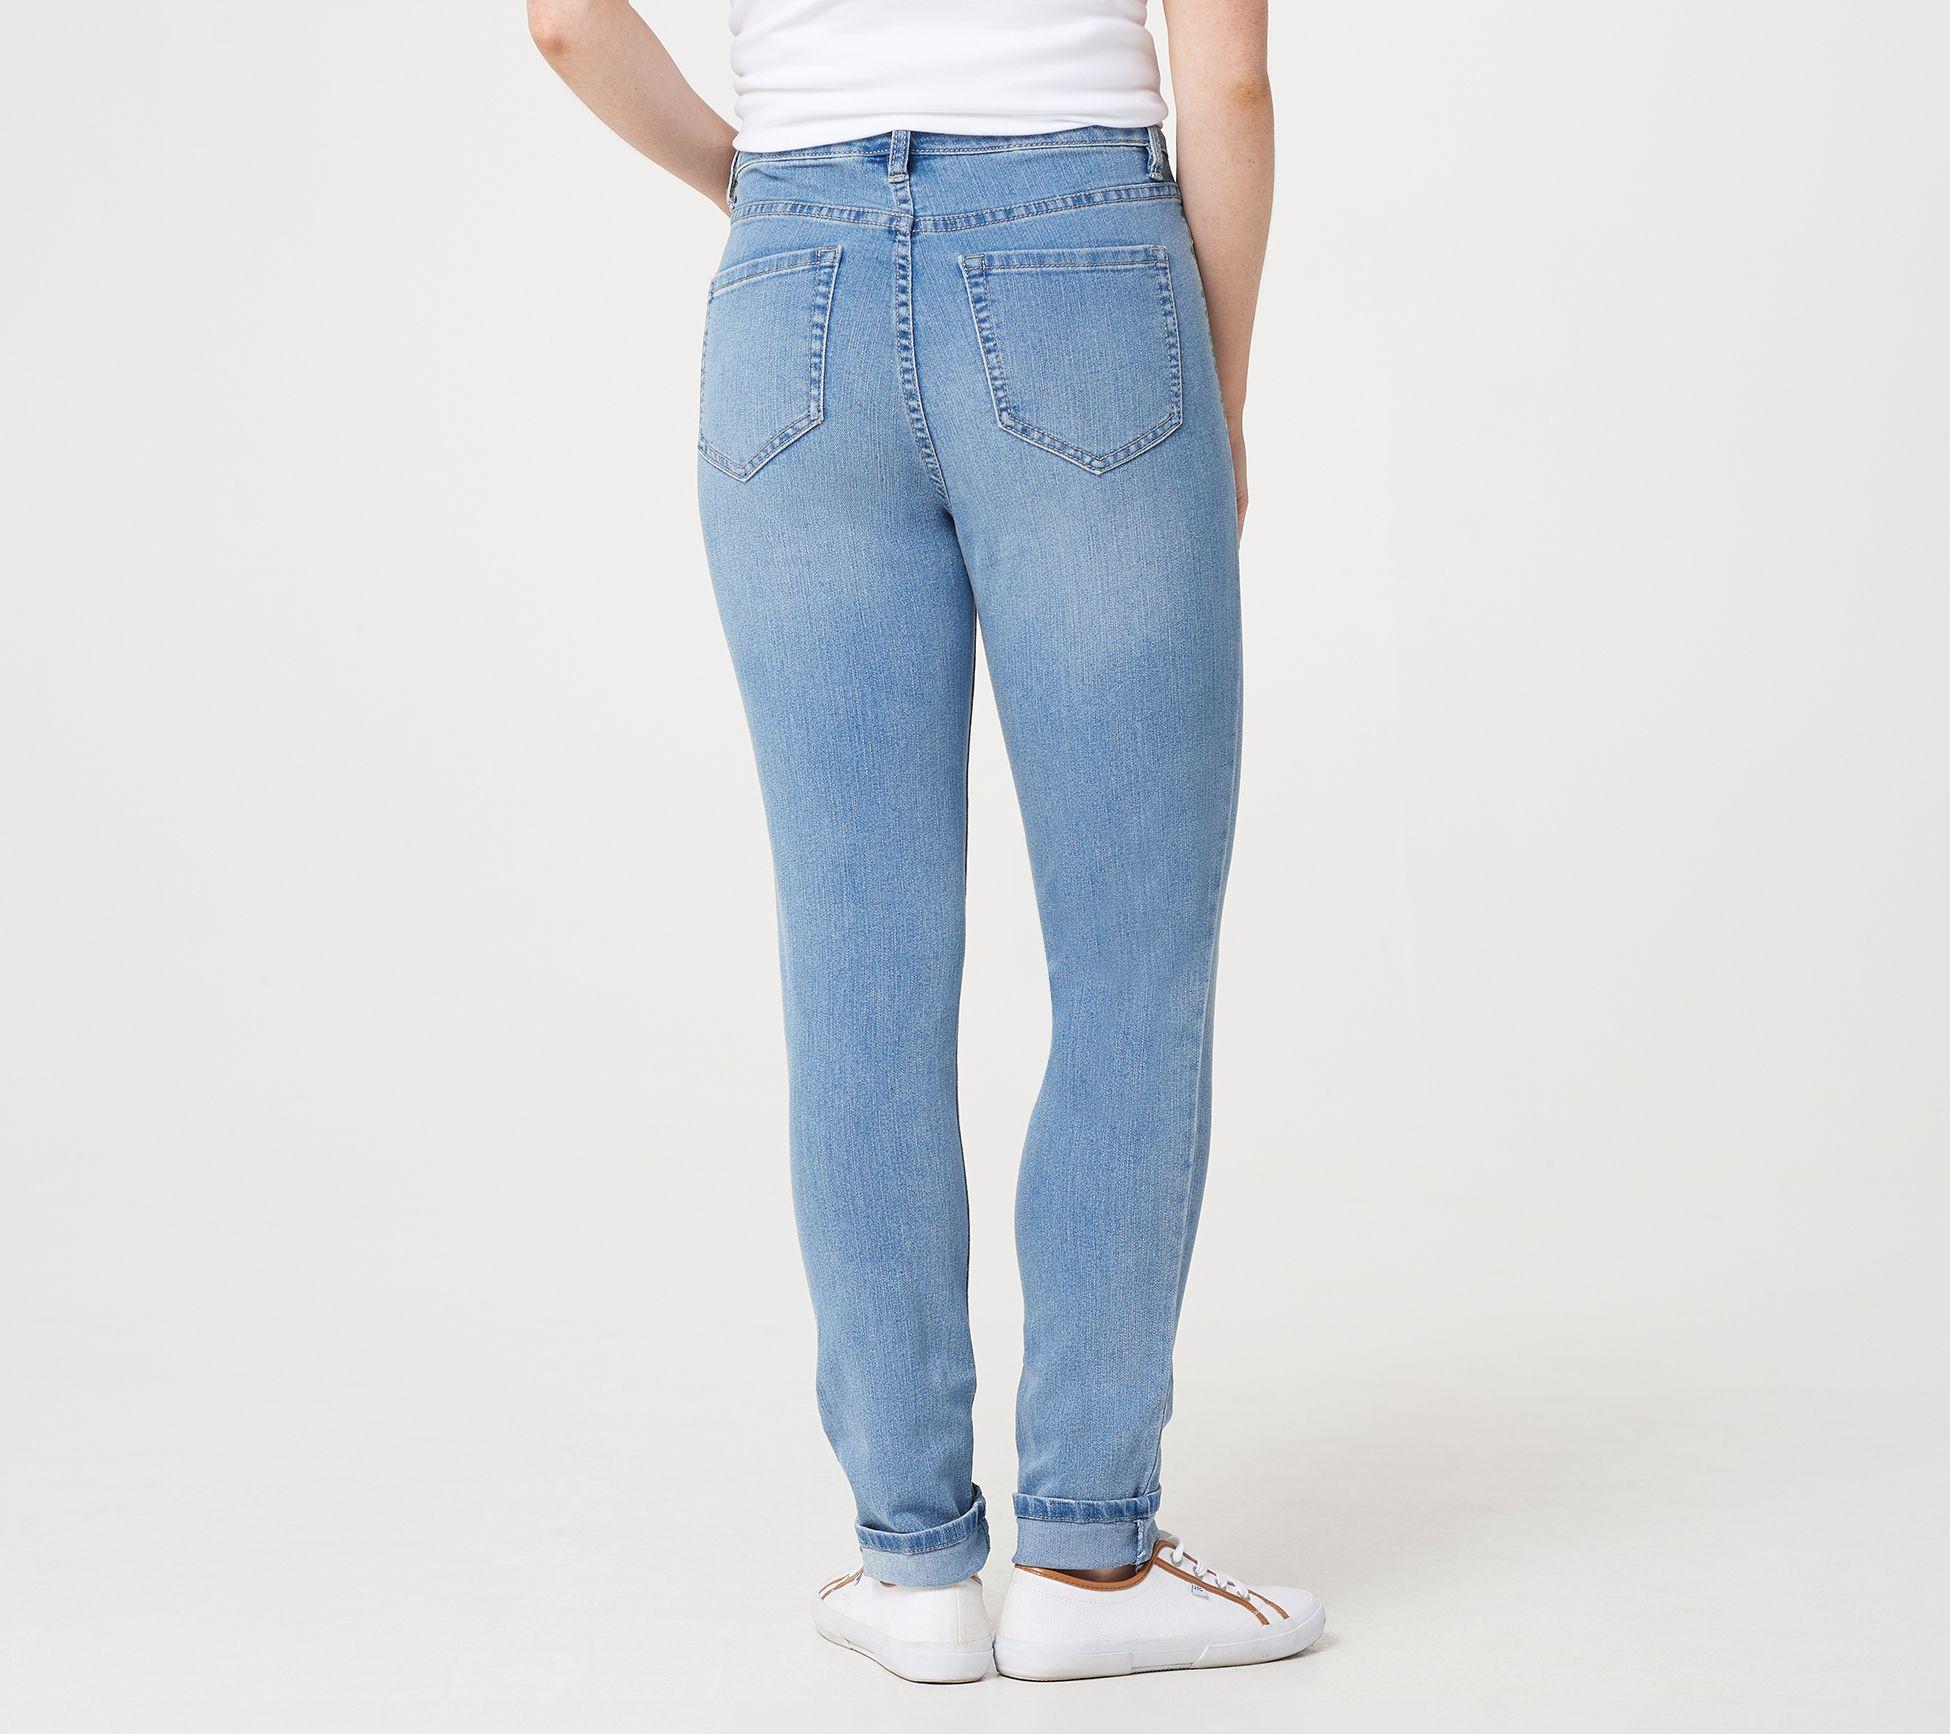 Denim & Co  Skinny Full-Length Jeans — QVC com